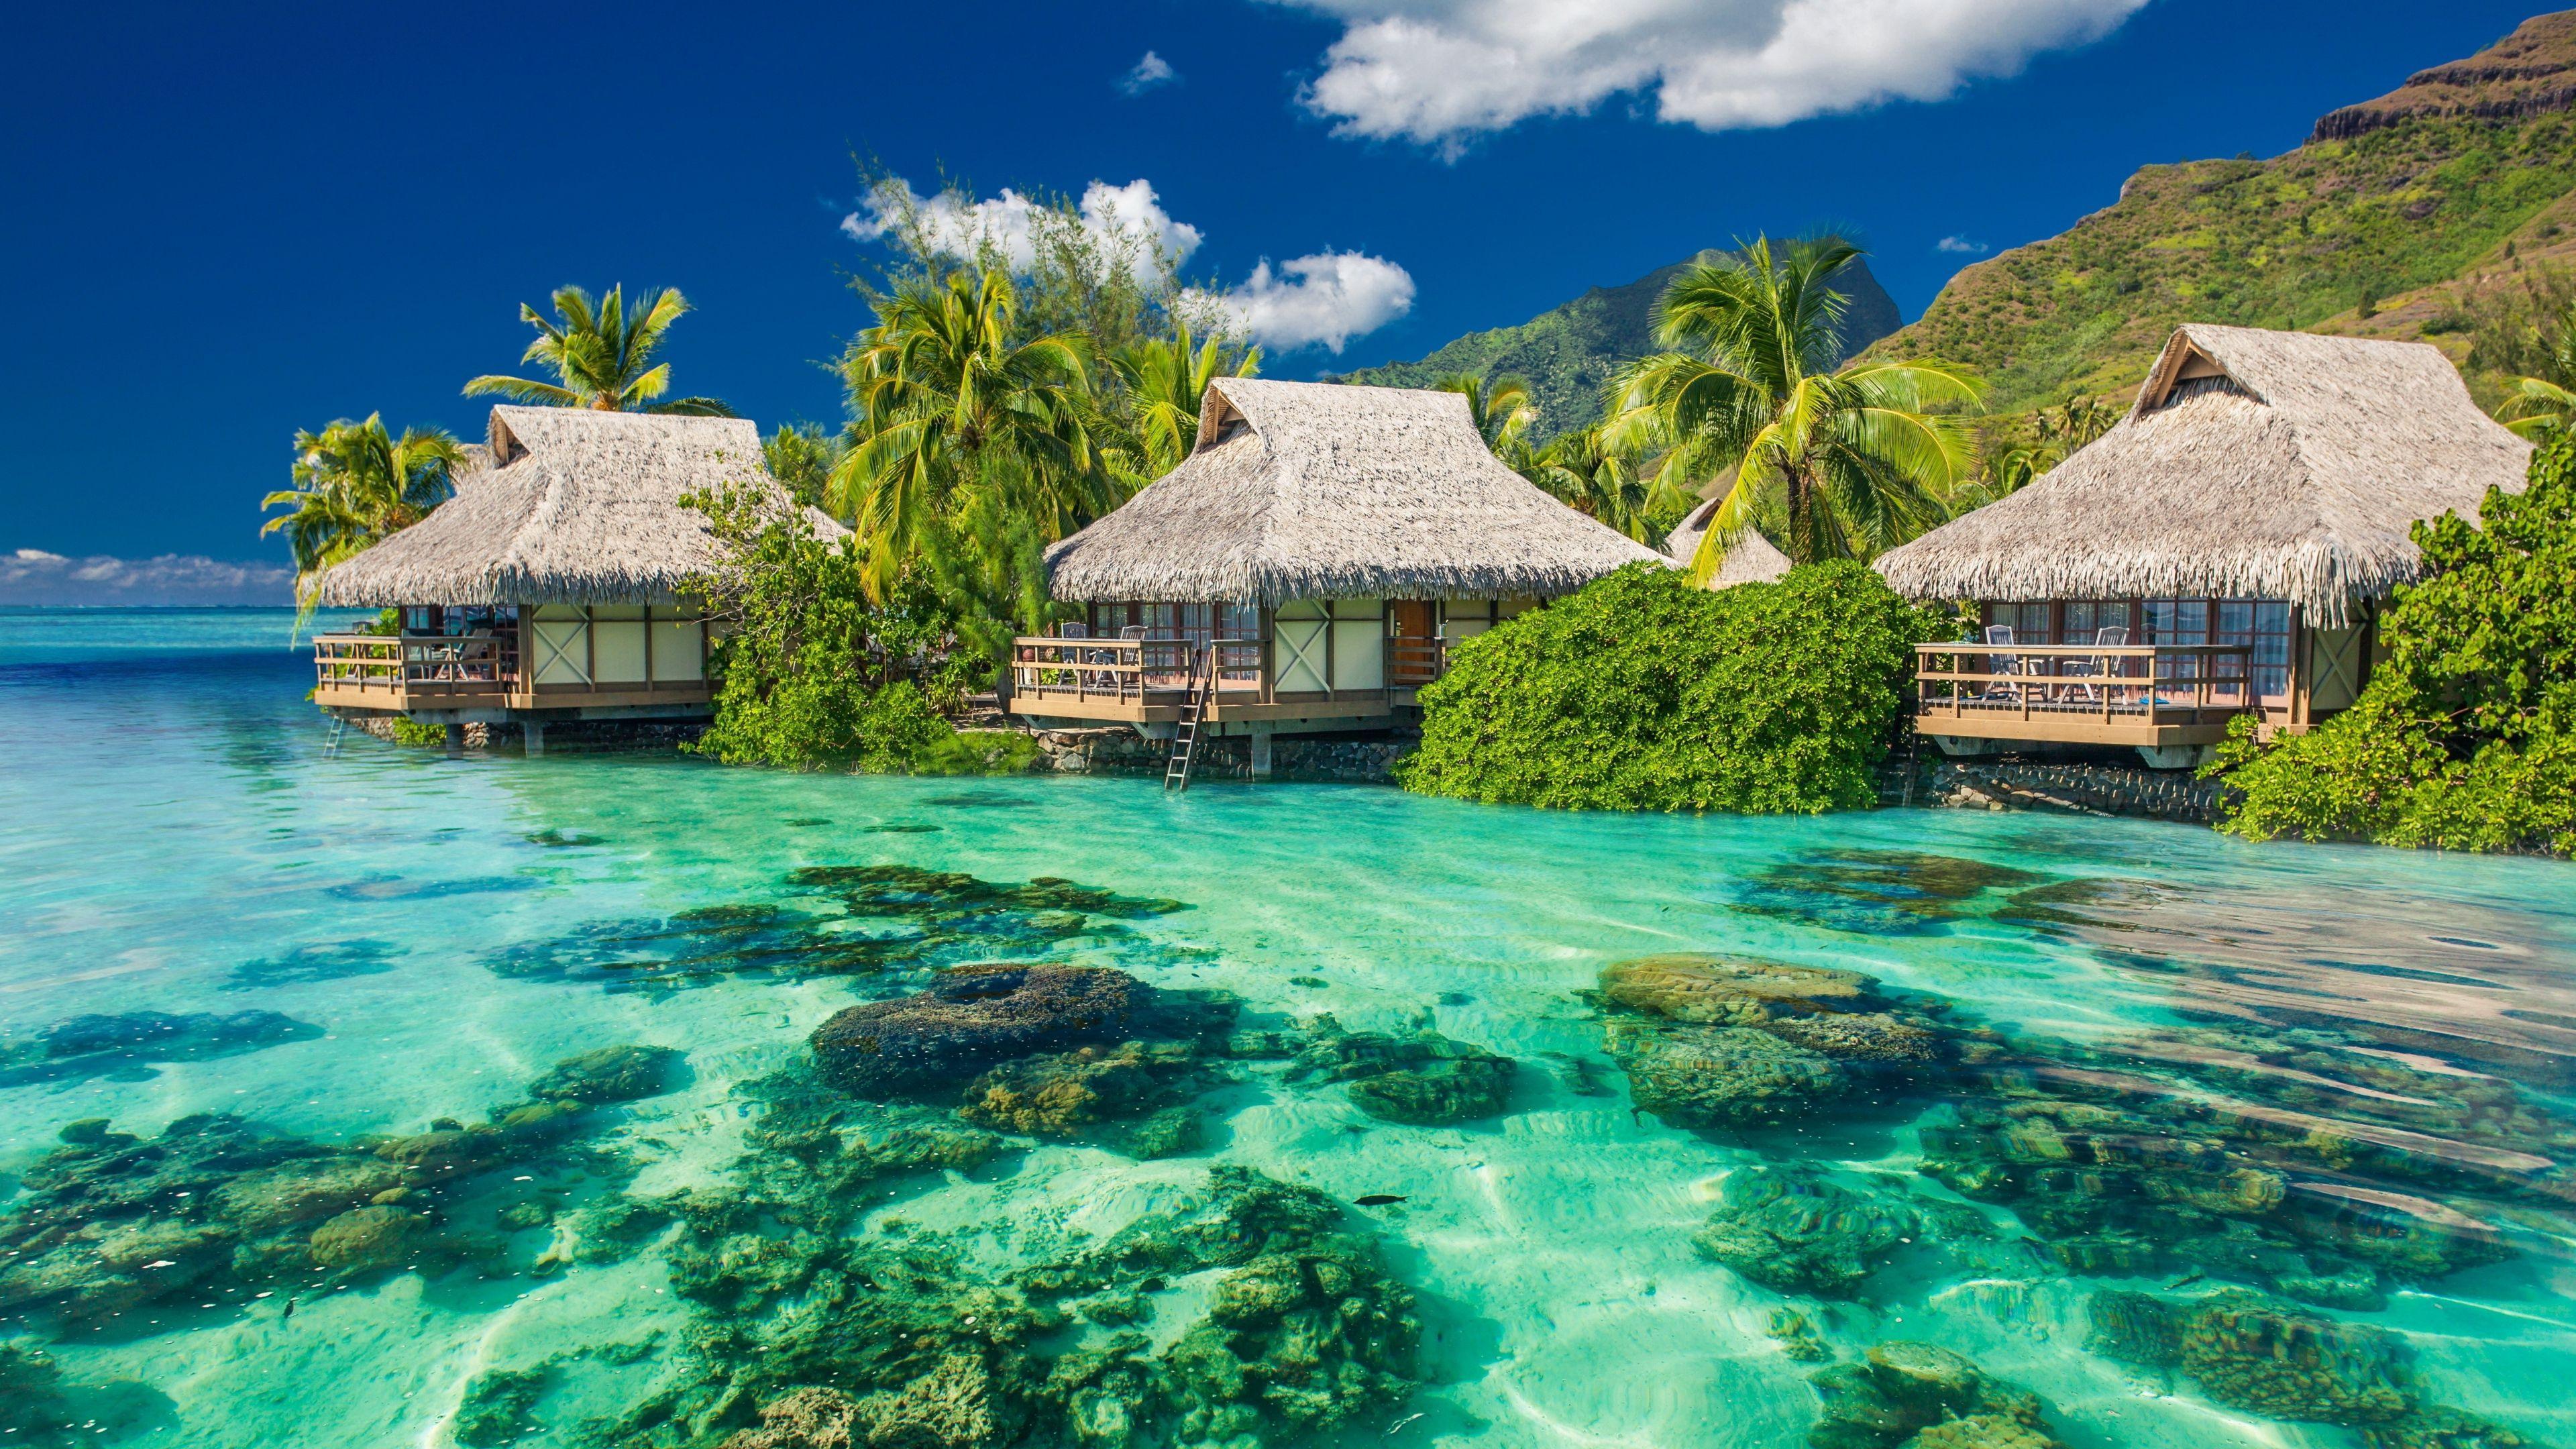 Tropical Paradise Beach 4k Hd Desktop Wallpaper For 4k: 4K Ultra HD Beach Wallpapers